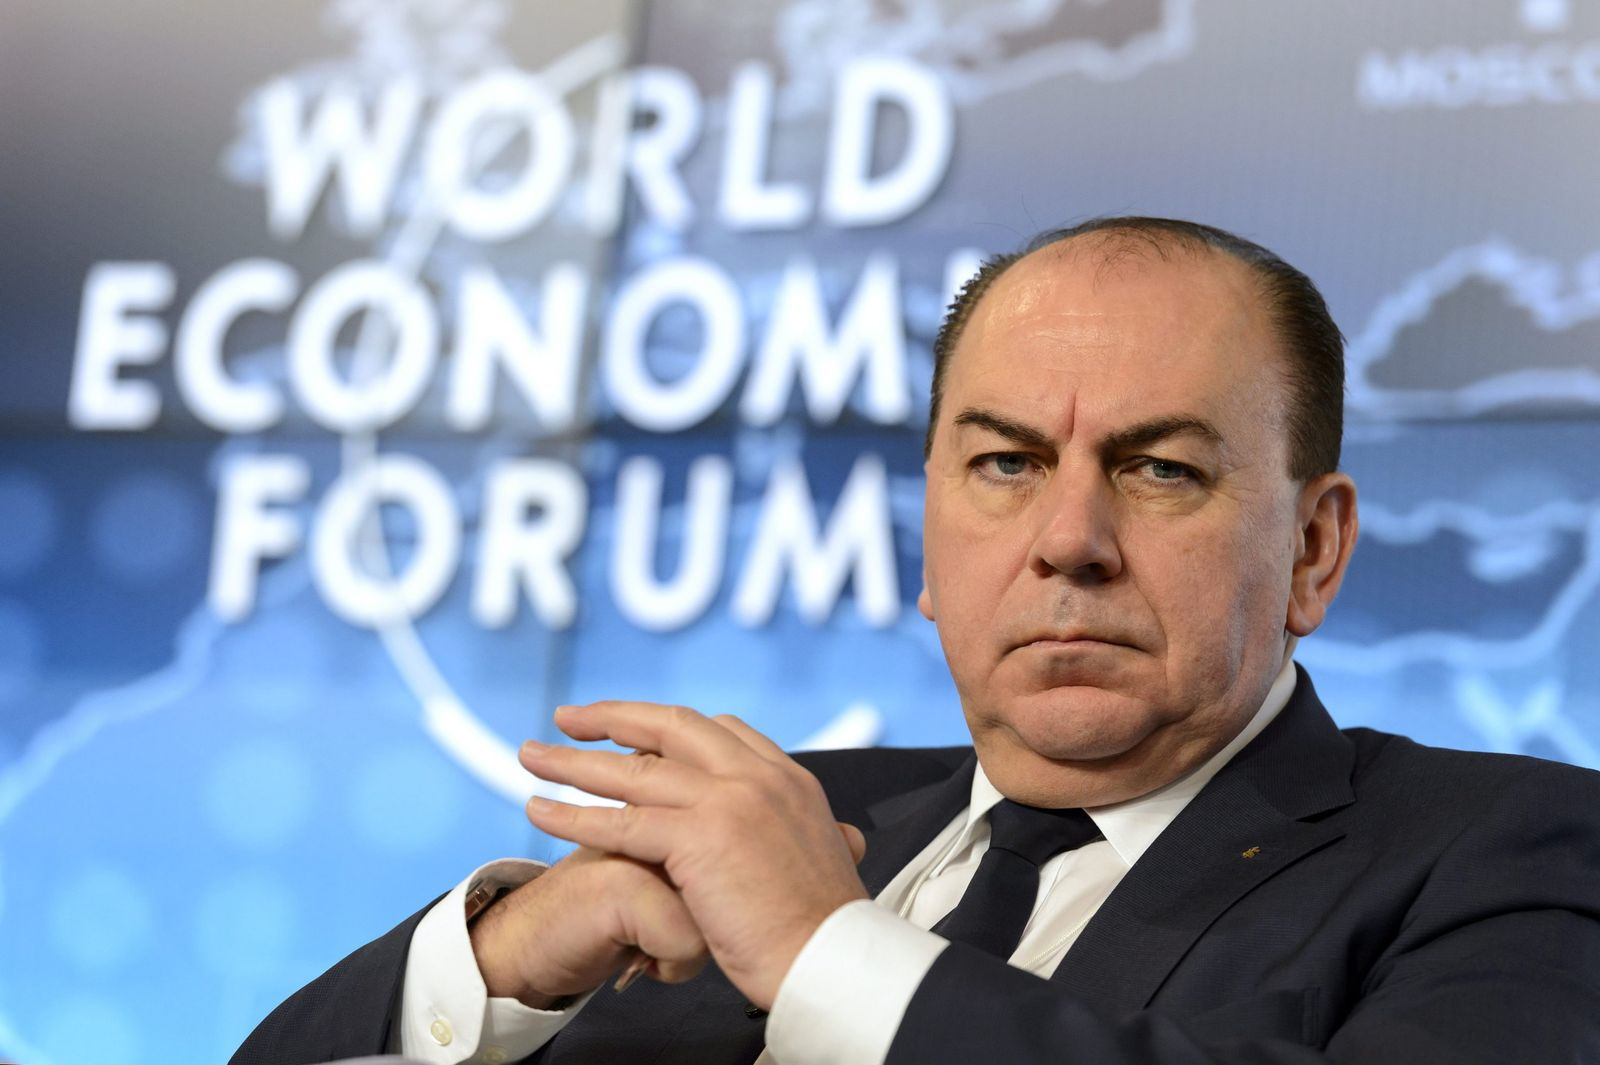 World Economic Forum in Davos Axel Weber